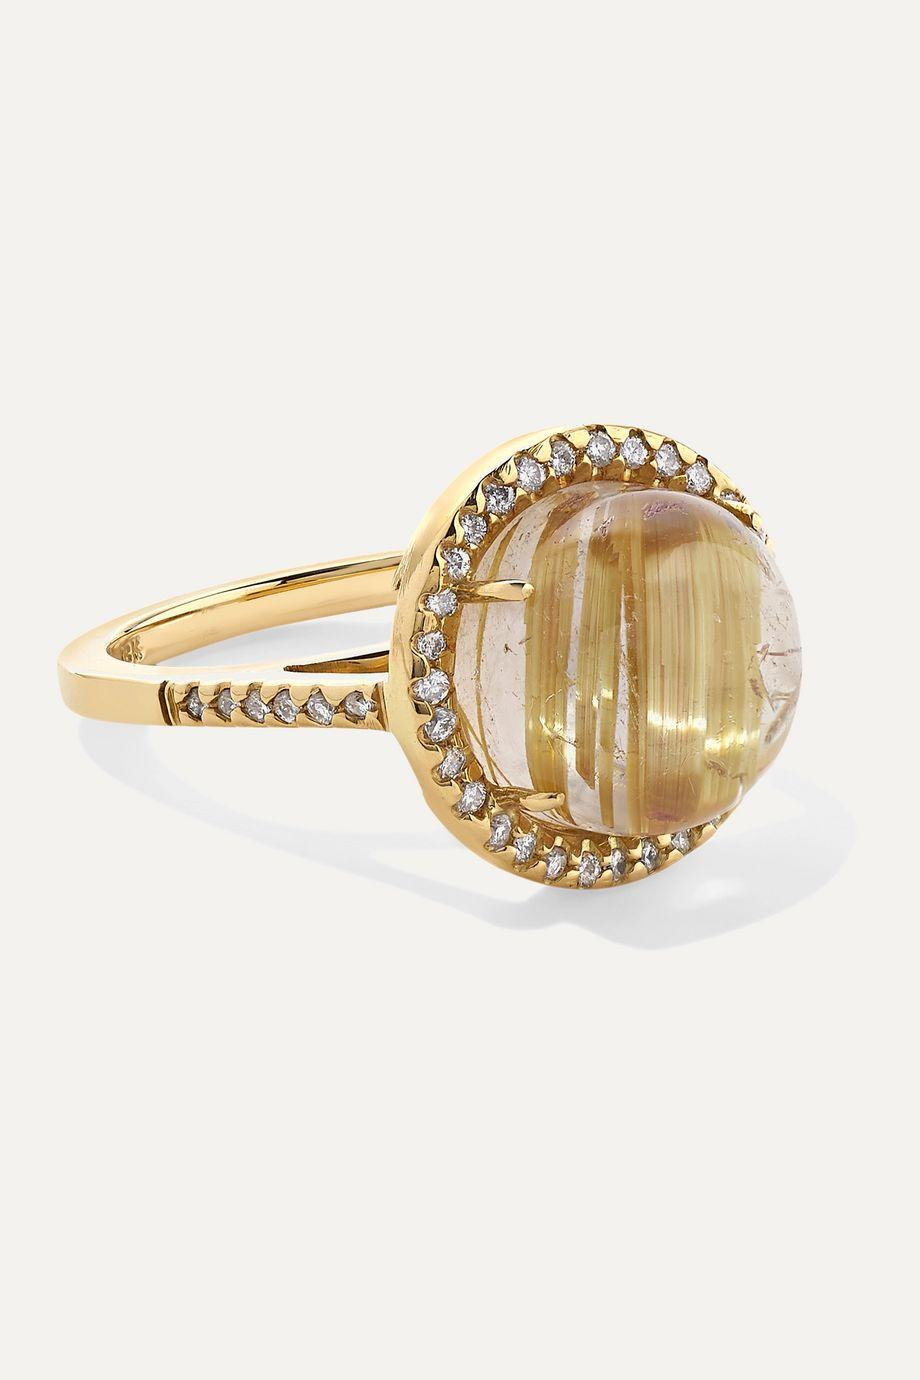 Kimberly McDonald 18-karat gold, quartz and diamond ring